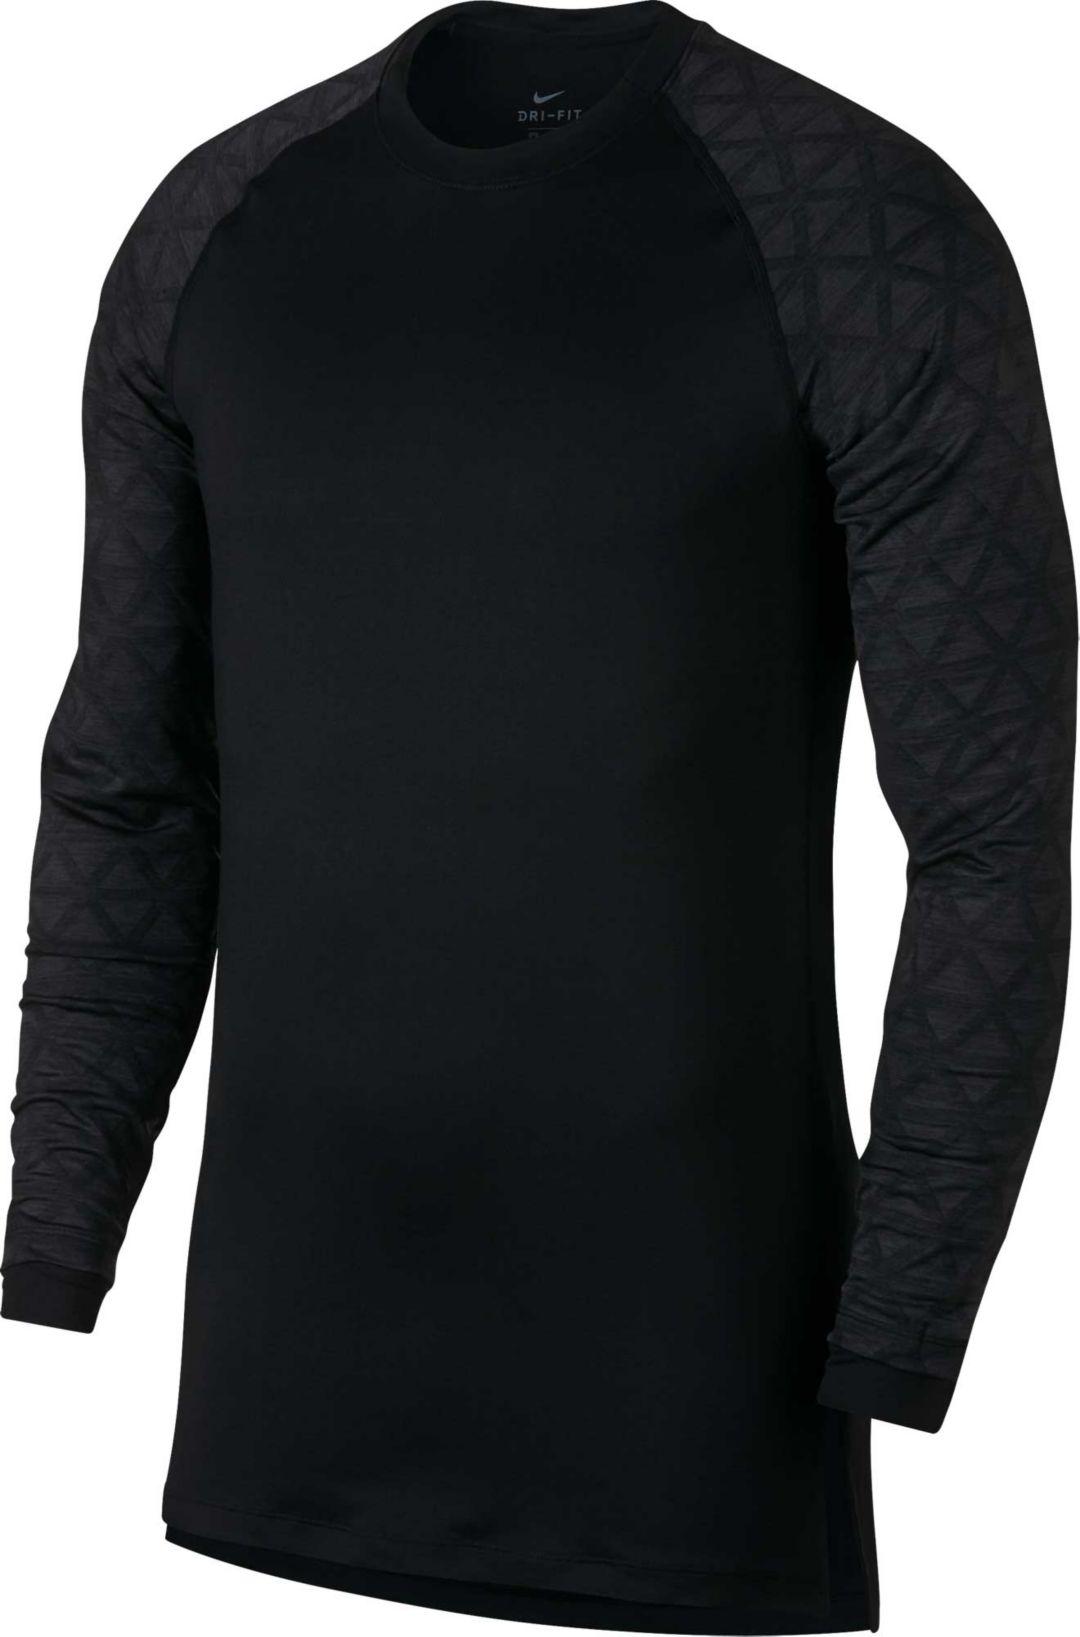 b281f531 Nike Men's Pro Therma Utility Long Sleeve Shirt | DICK'S Sporting Goods